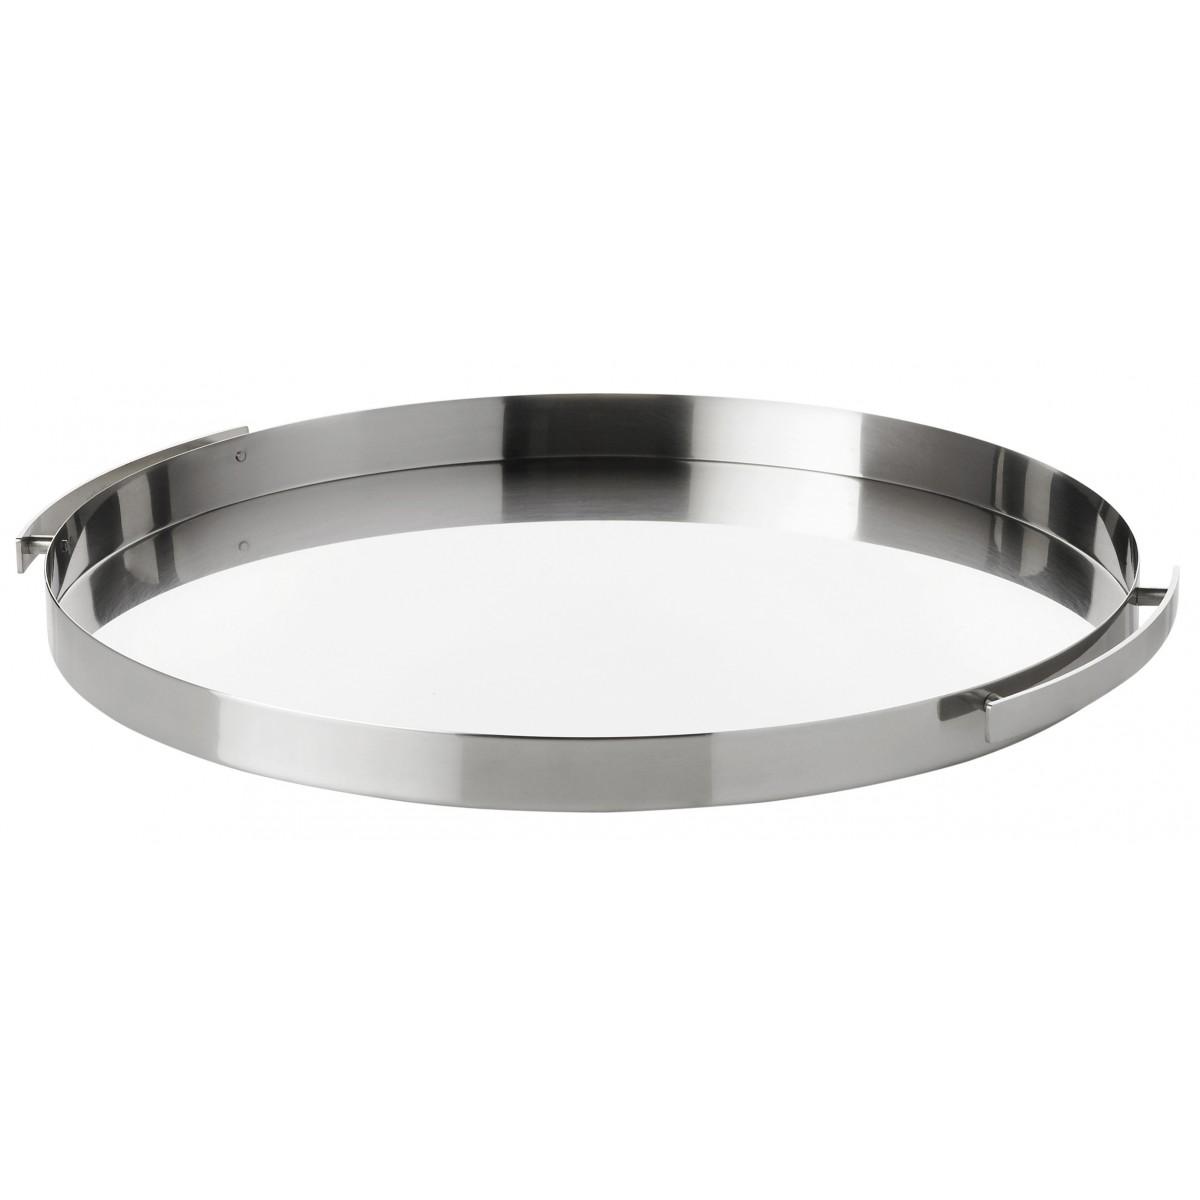 STELTON AJ Serveringsbakke 33,5 cm - stål